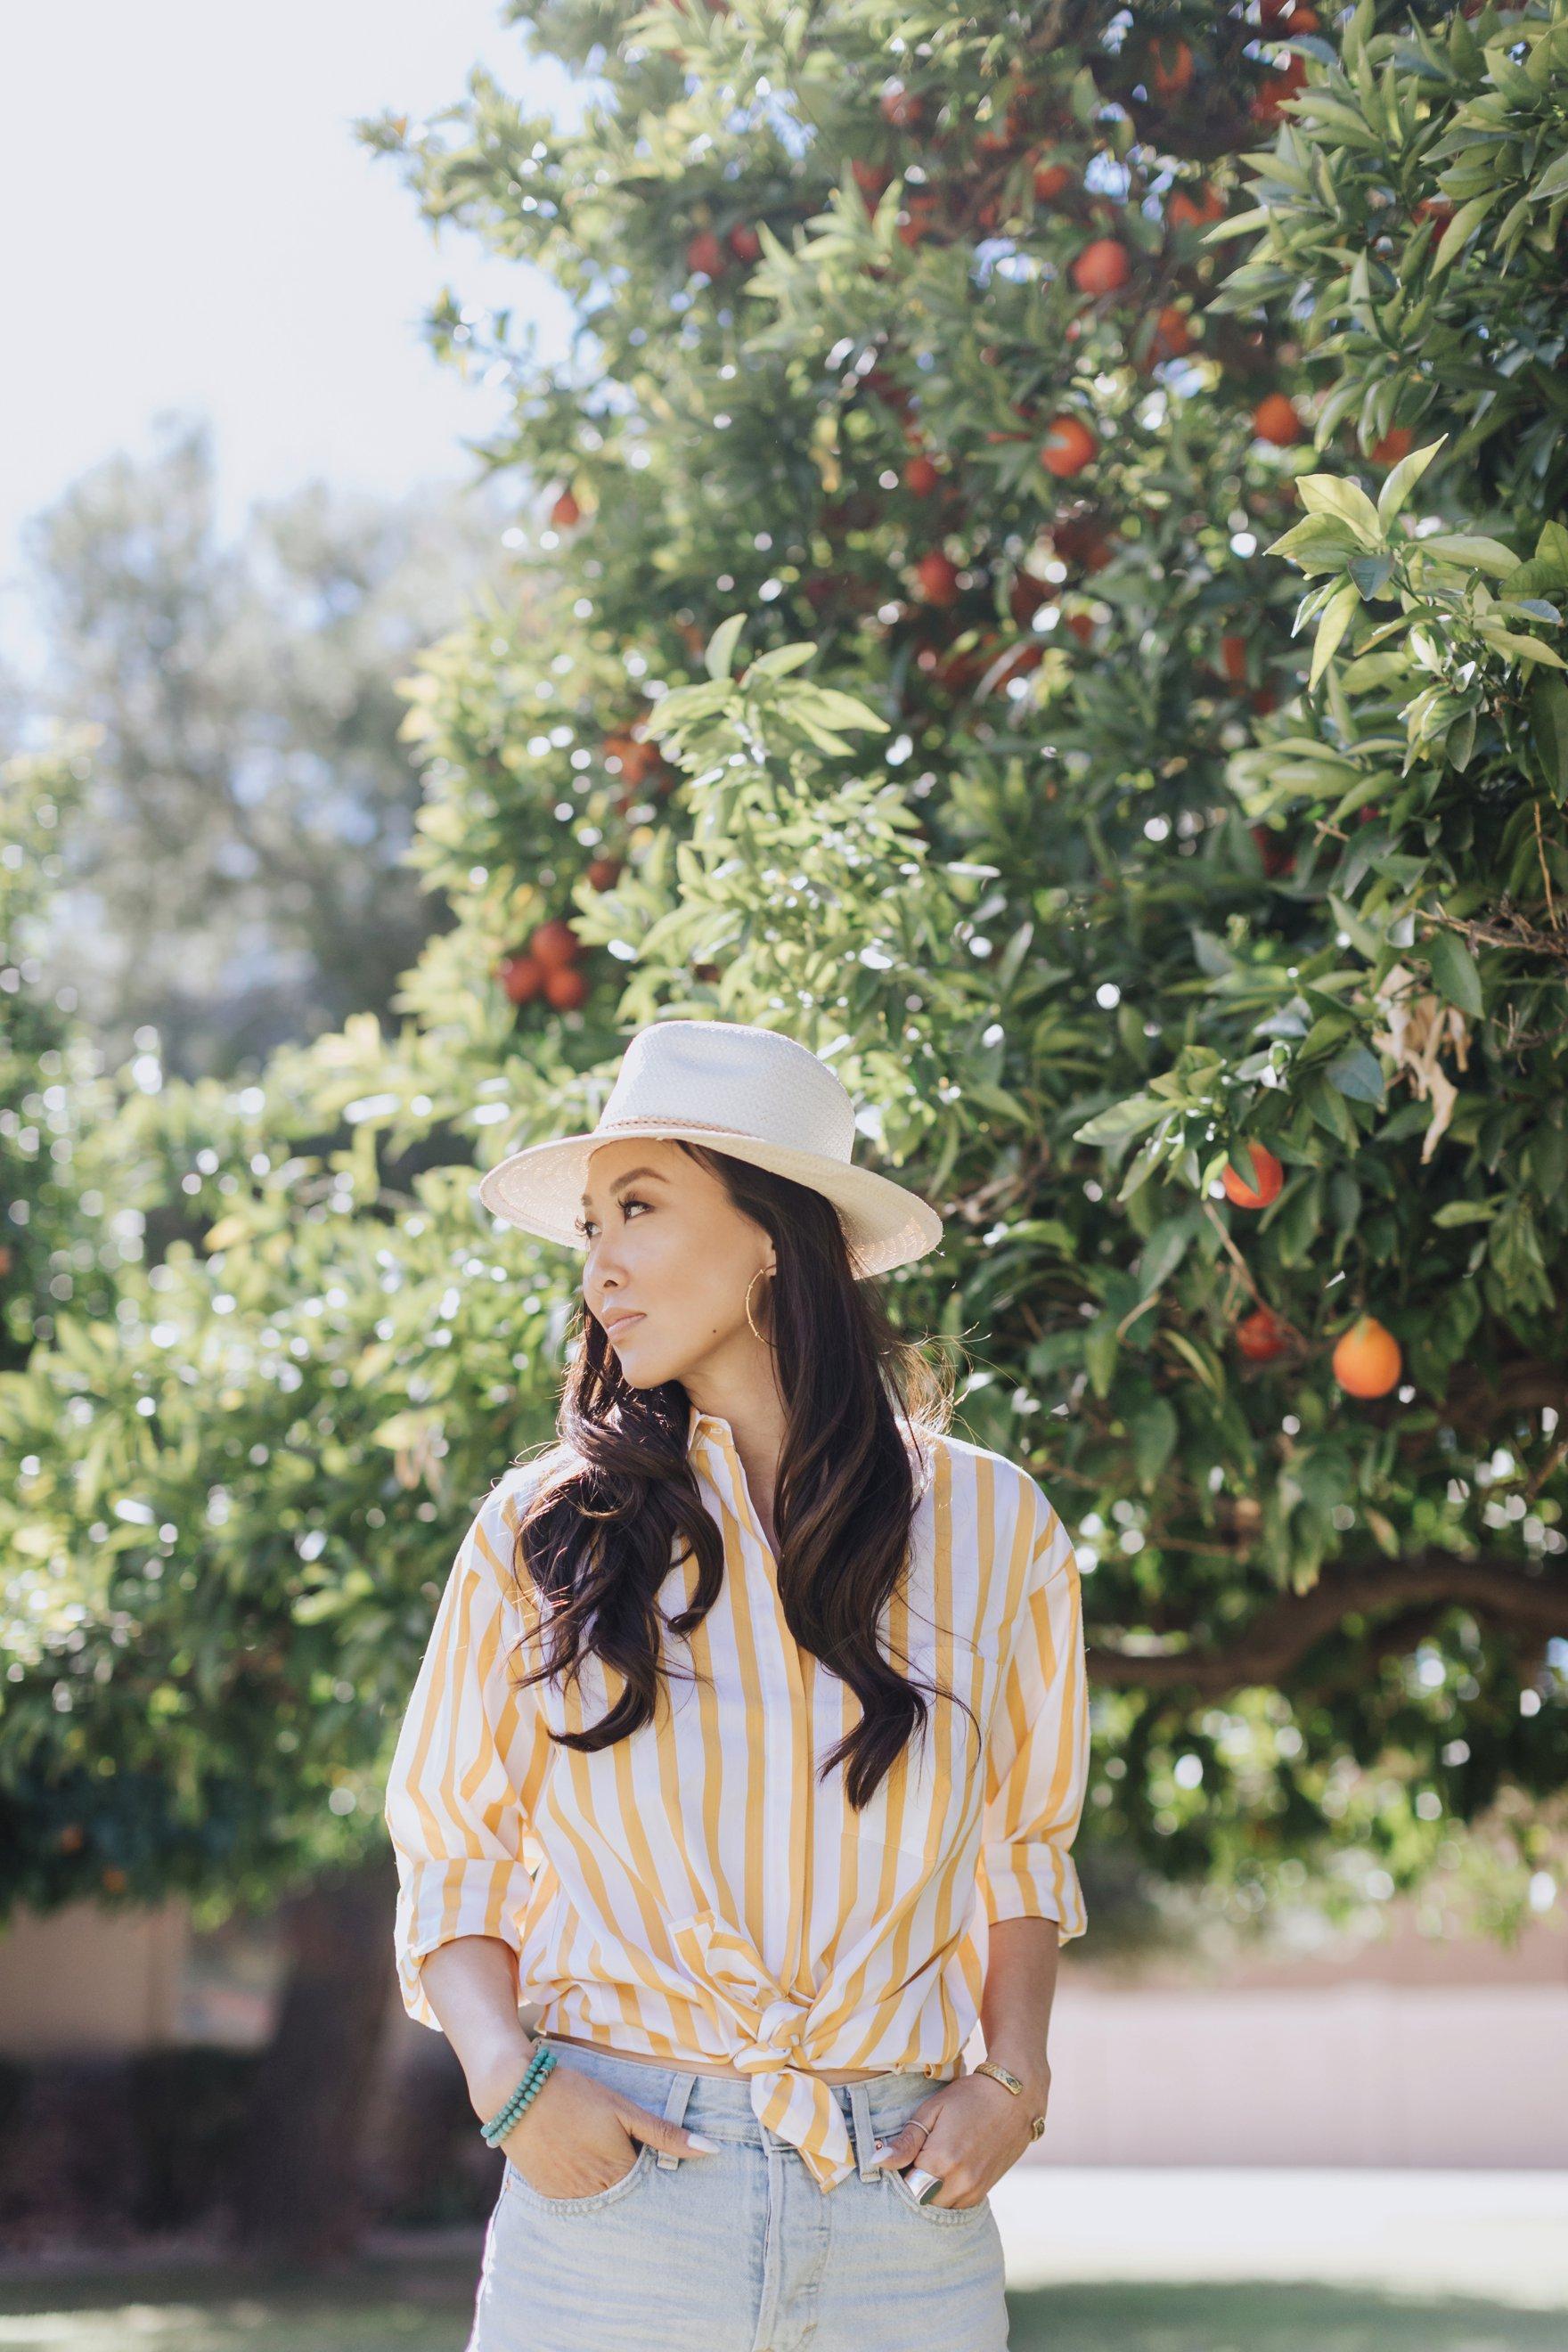 yellow stripe shirt straw hat picking citrus lemons blood red oranges Diana Elizabeth phoenix blogger